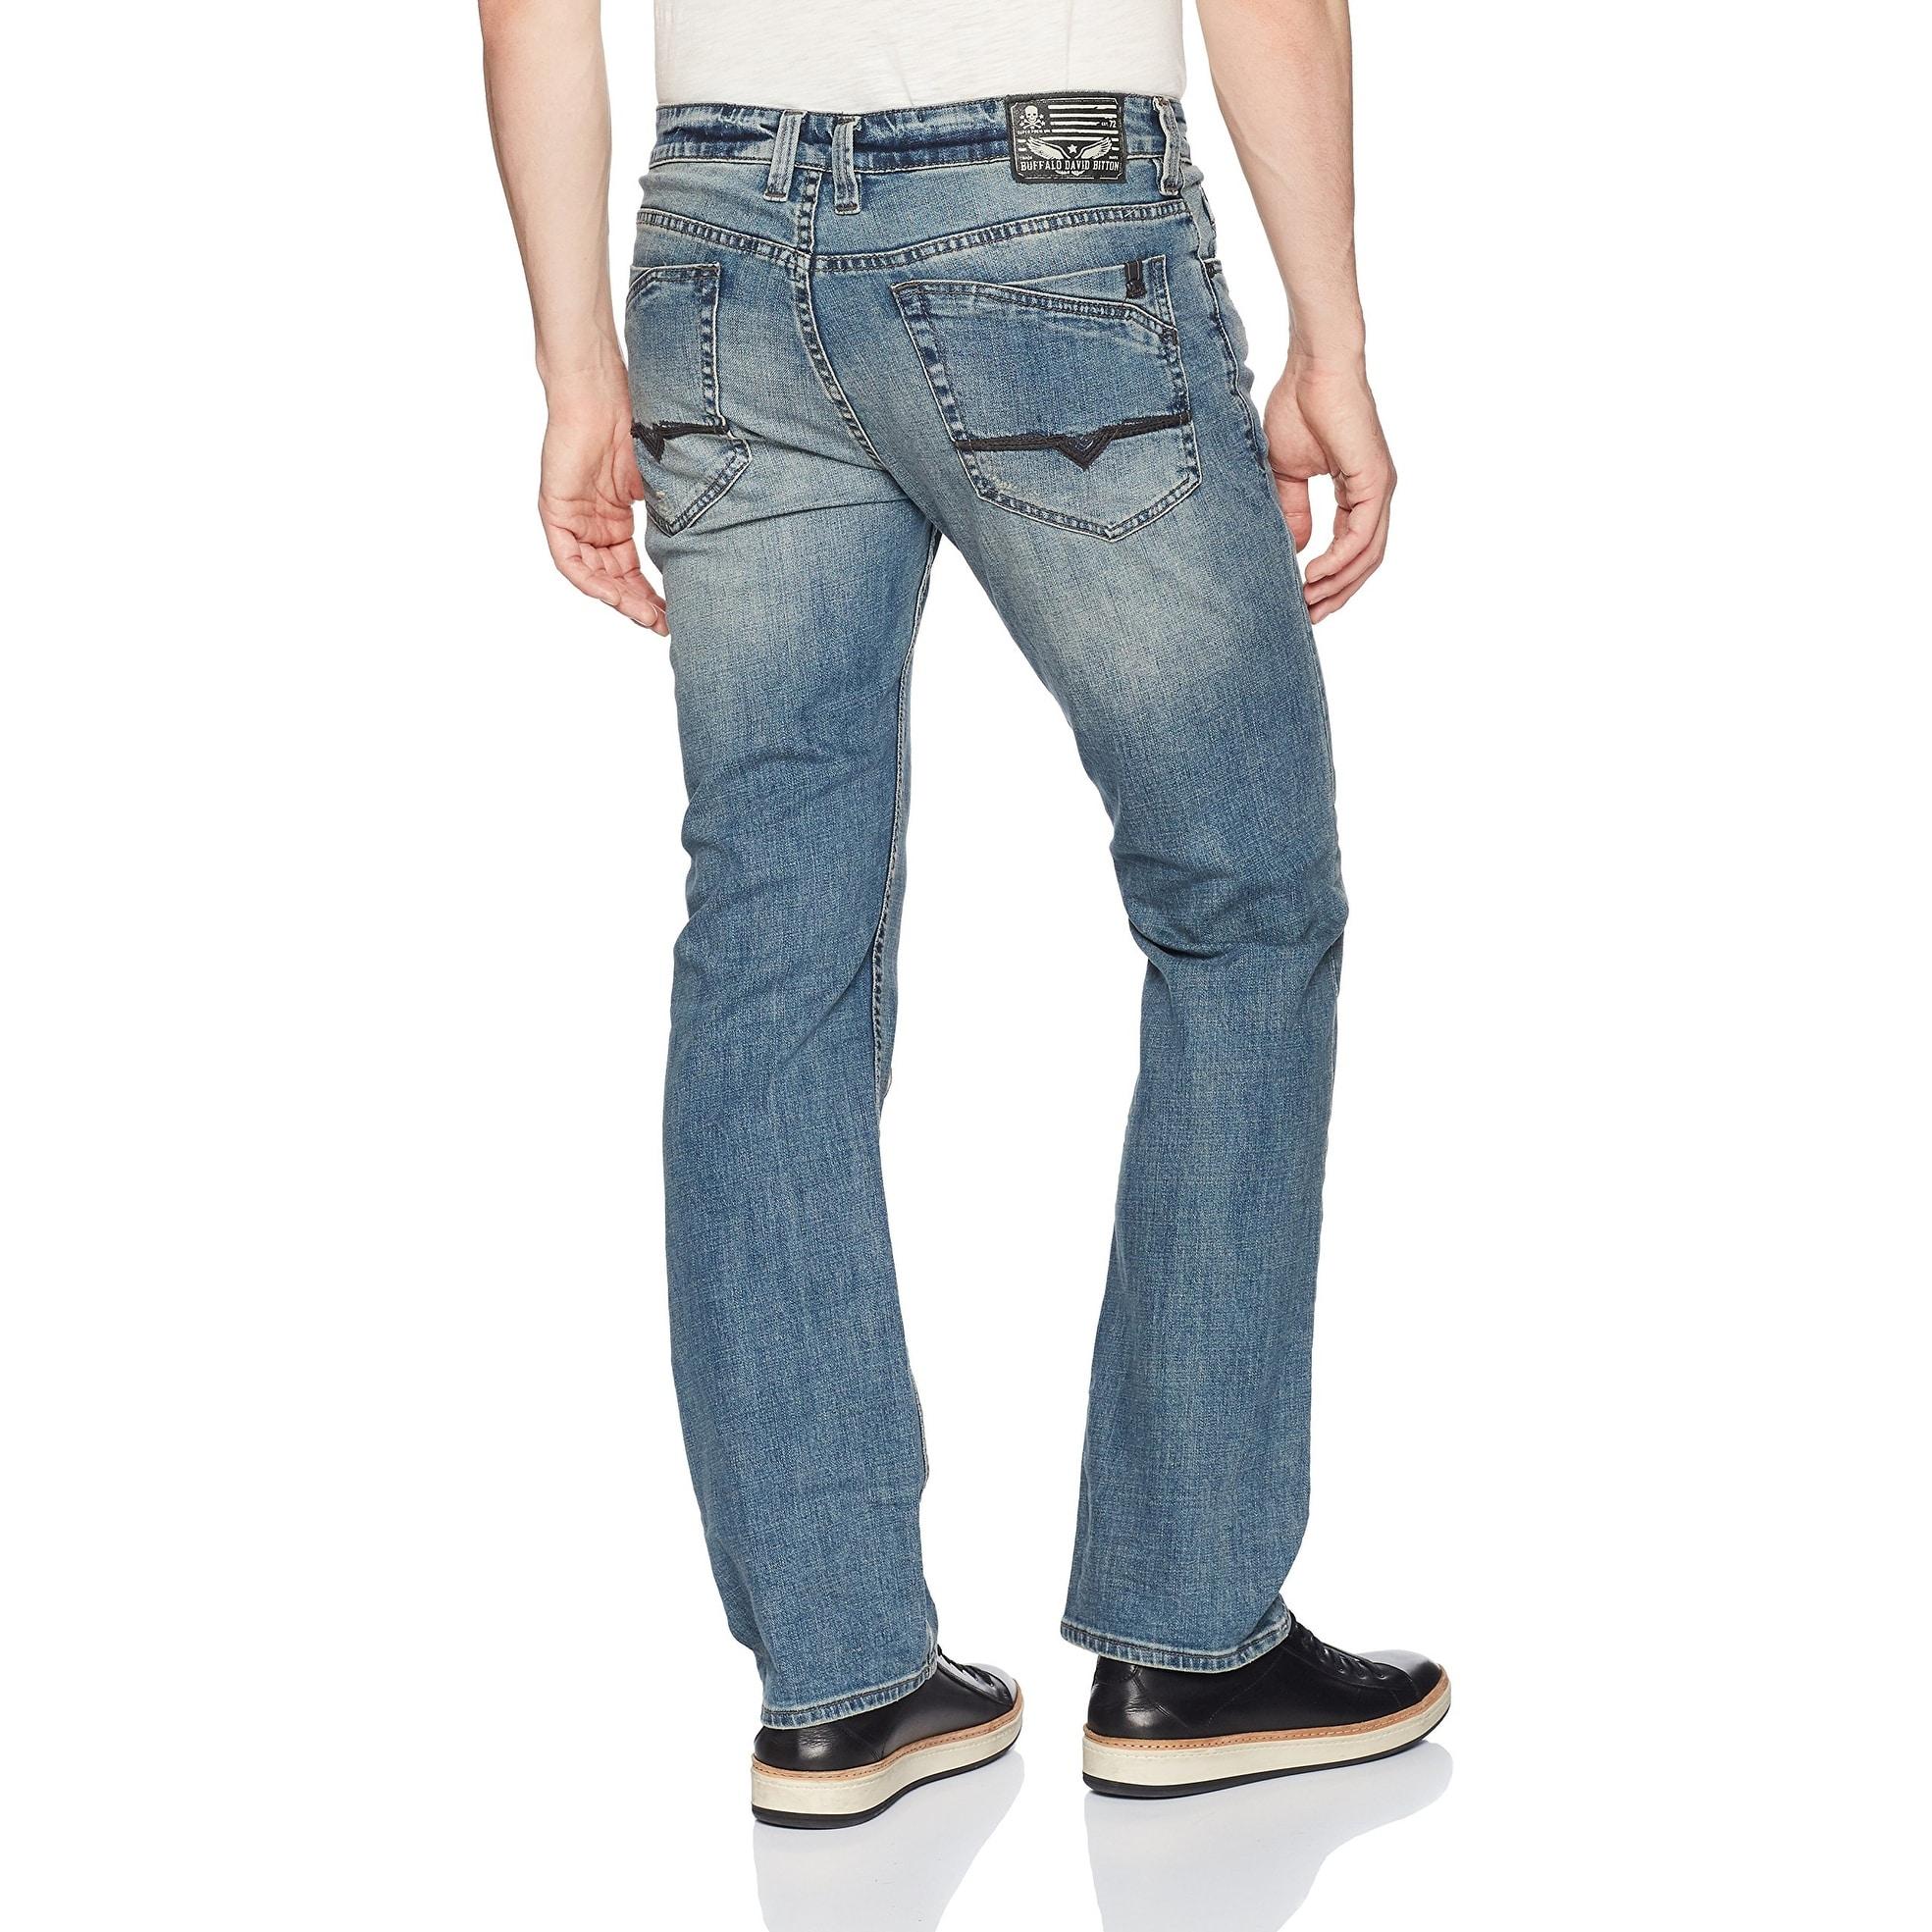 ba4c9f82 Shop Buffalo David Bitton Blue Mens Size 34X32 Patch Straight Leg ...